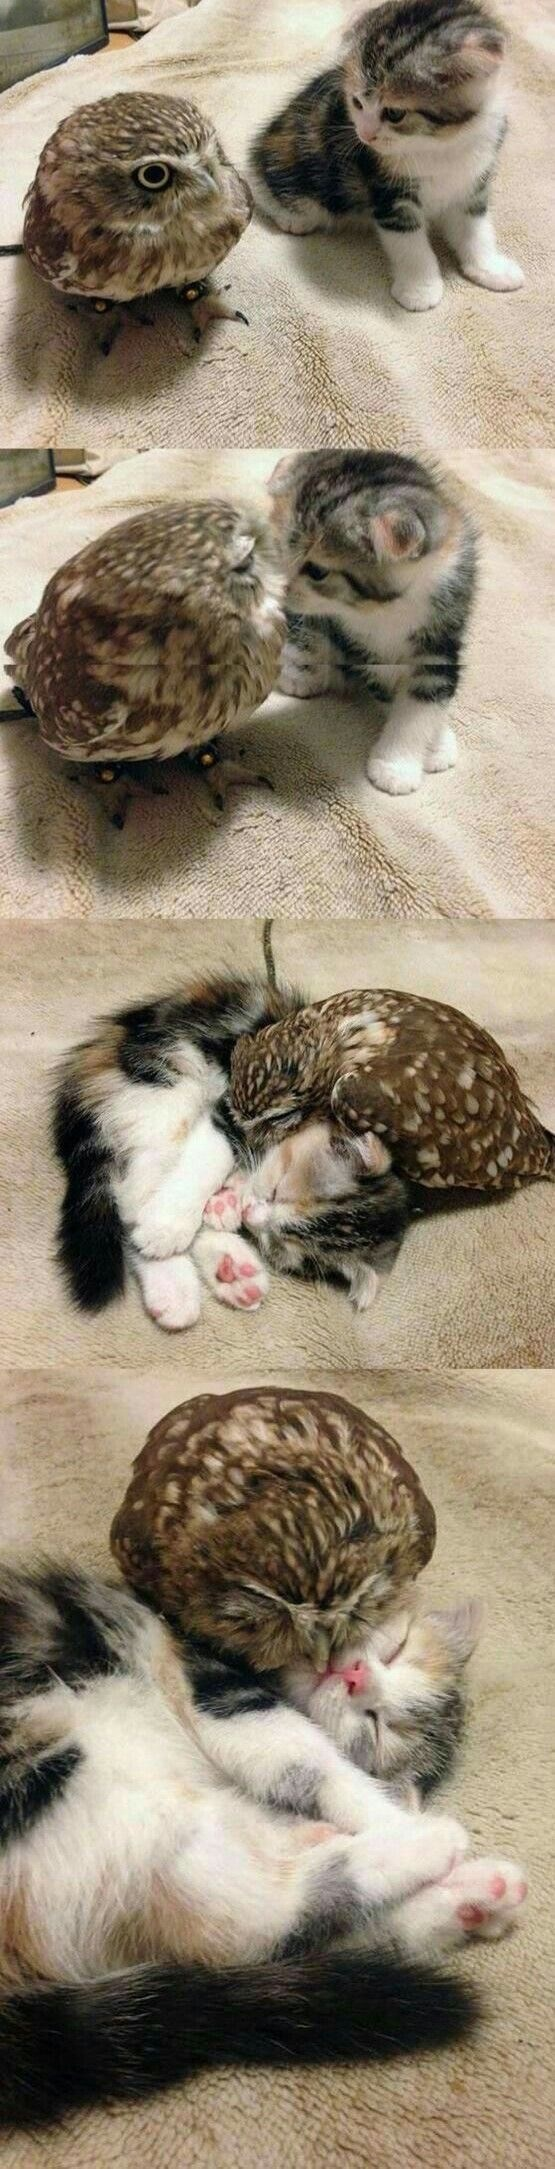 aww kitten Owl cuddles - 9007147776